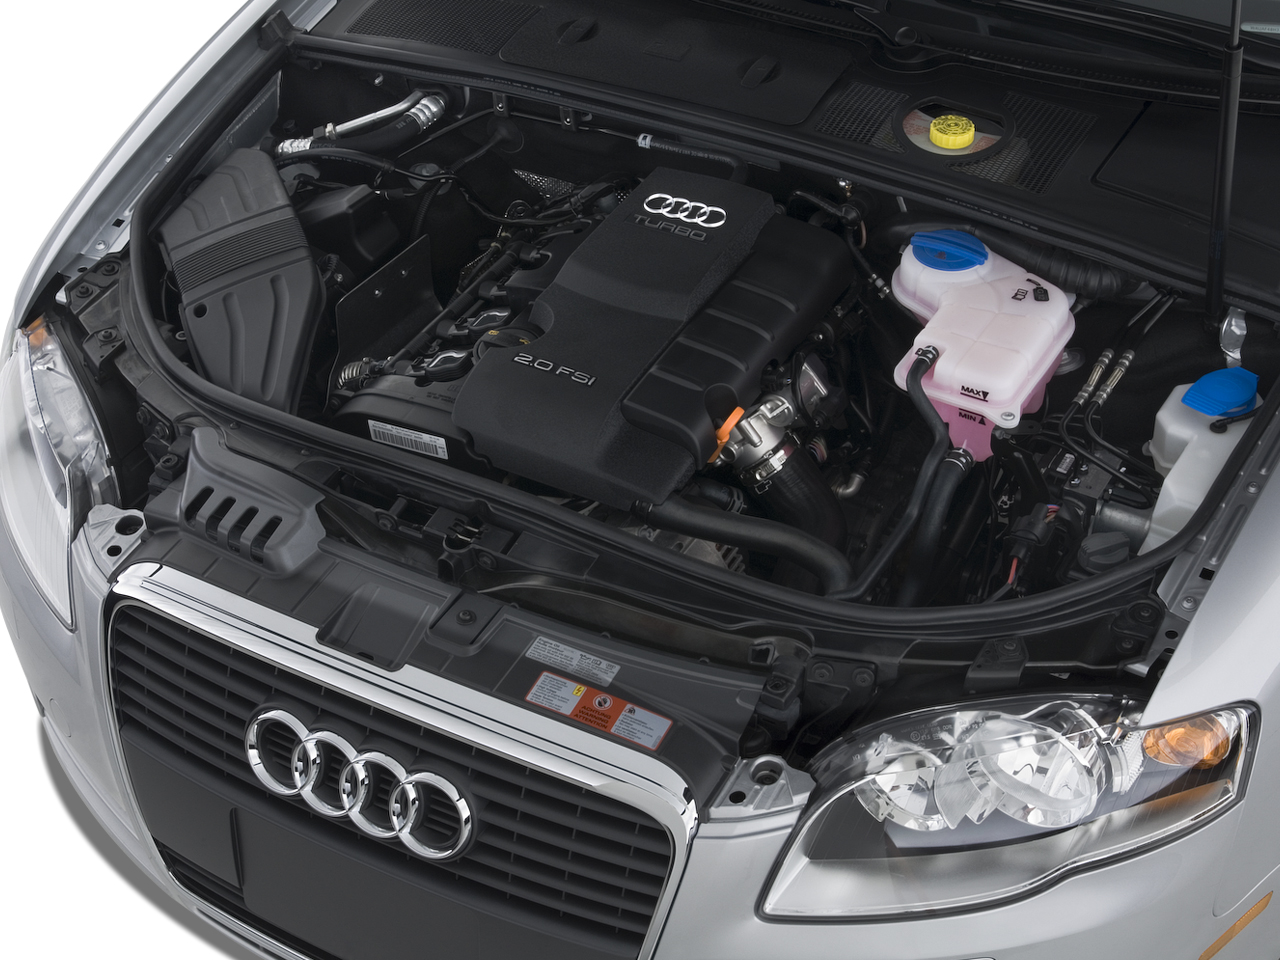 KM_9753] 2006 Audi A6 Engine Diagram Wiring DiagramRine Inifo Pap Mohammedshrine Librar Wiring 101